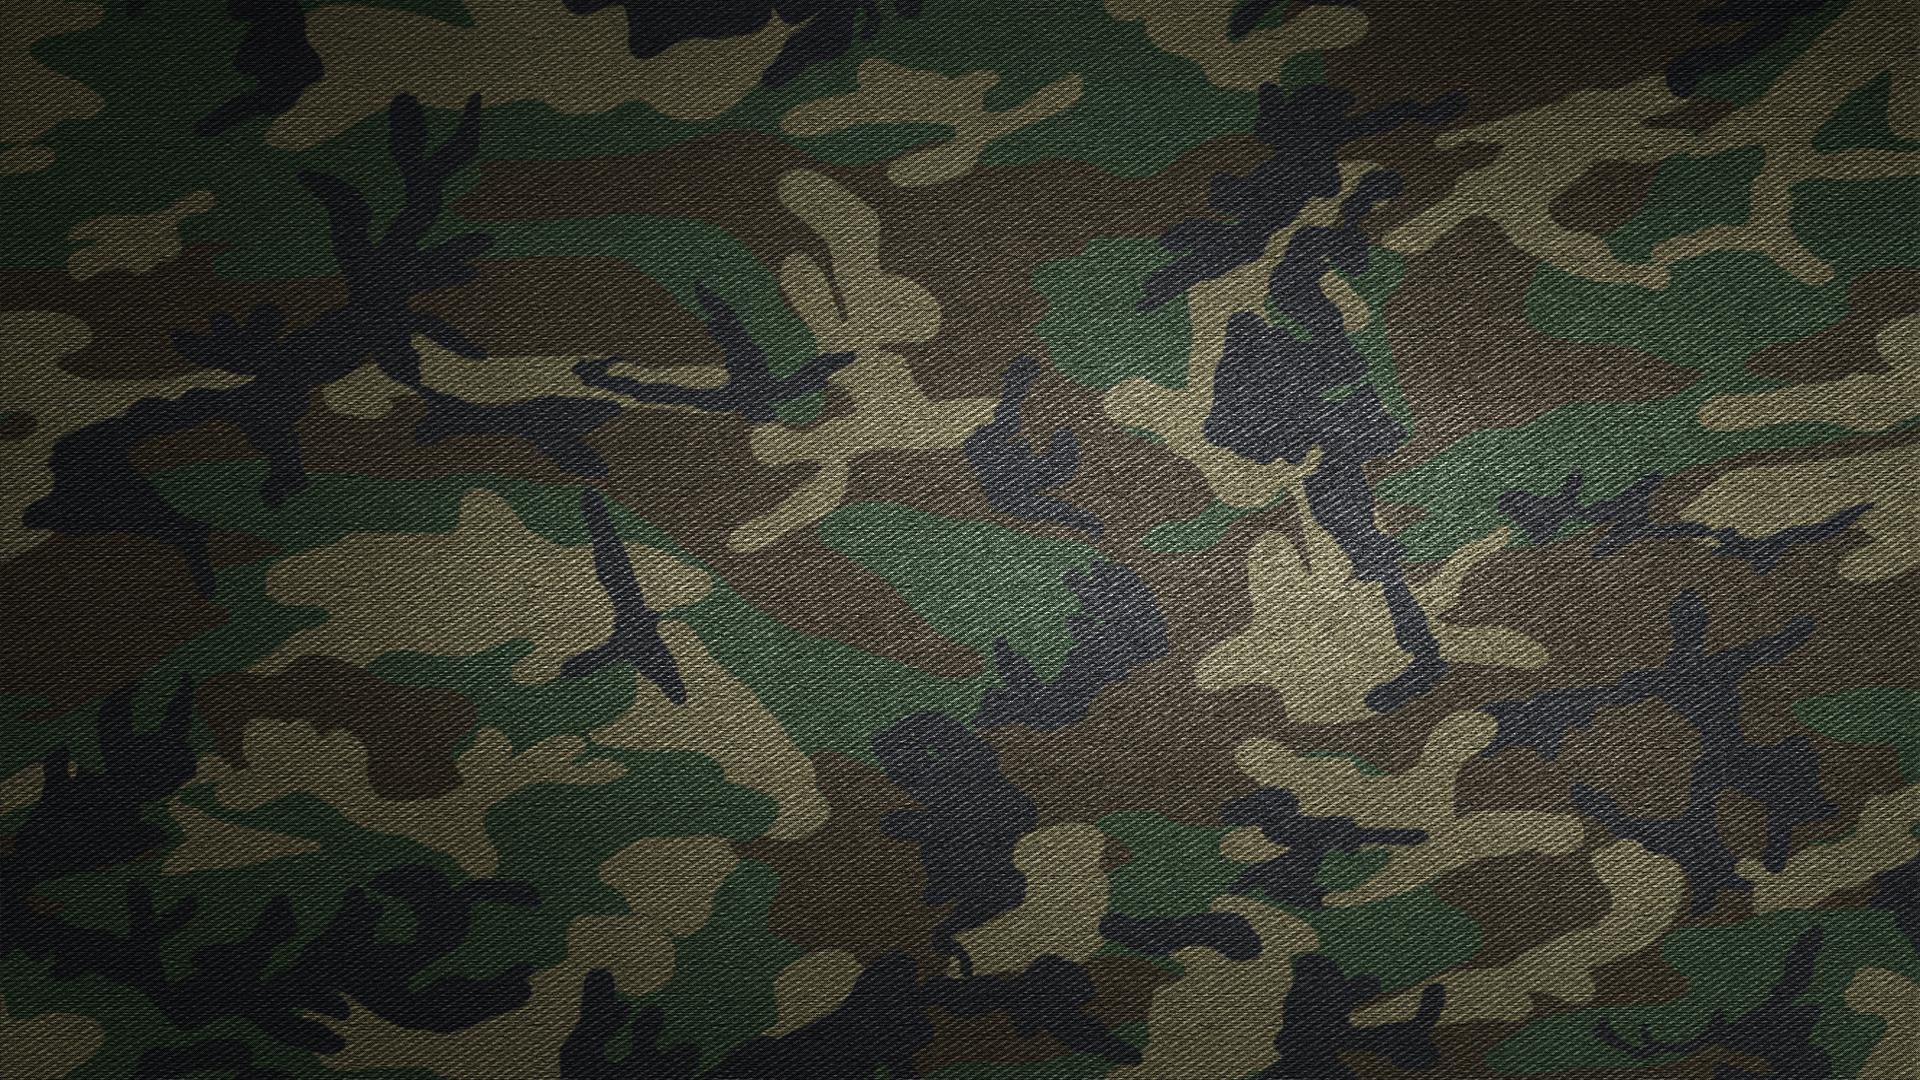 comwp contentuploads201306military camo wallpaperpng 1920x1080